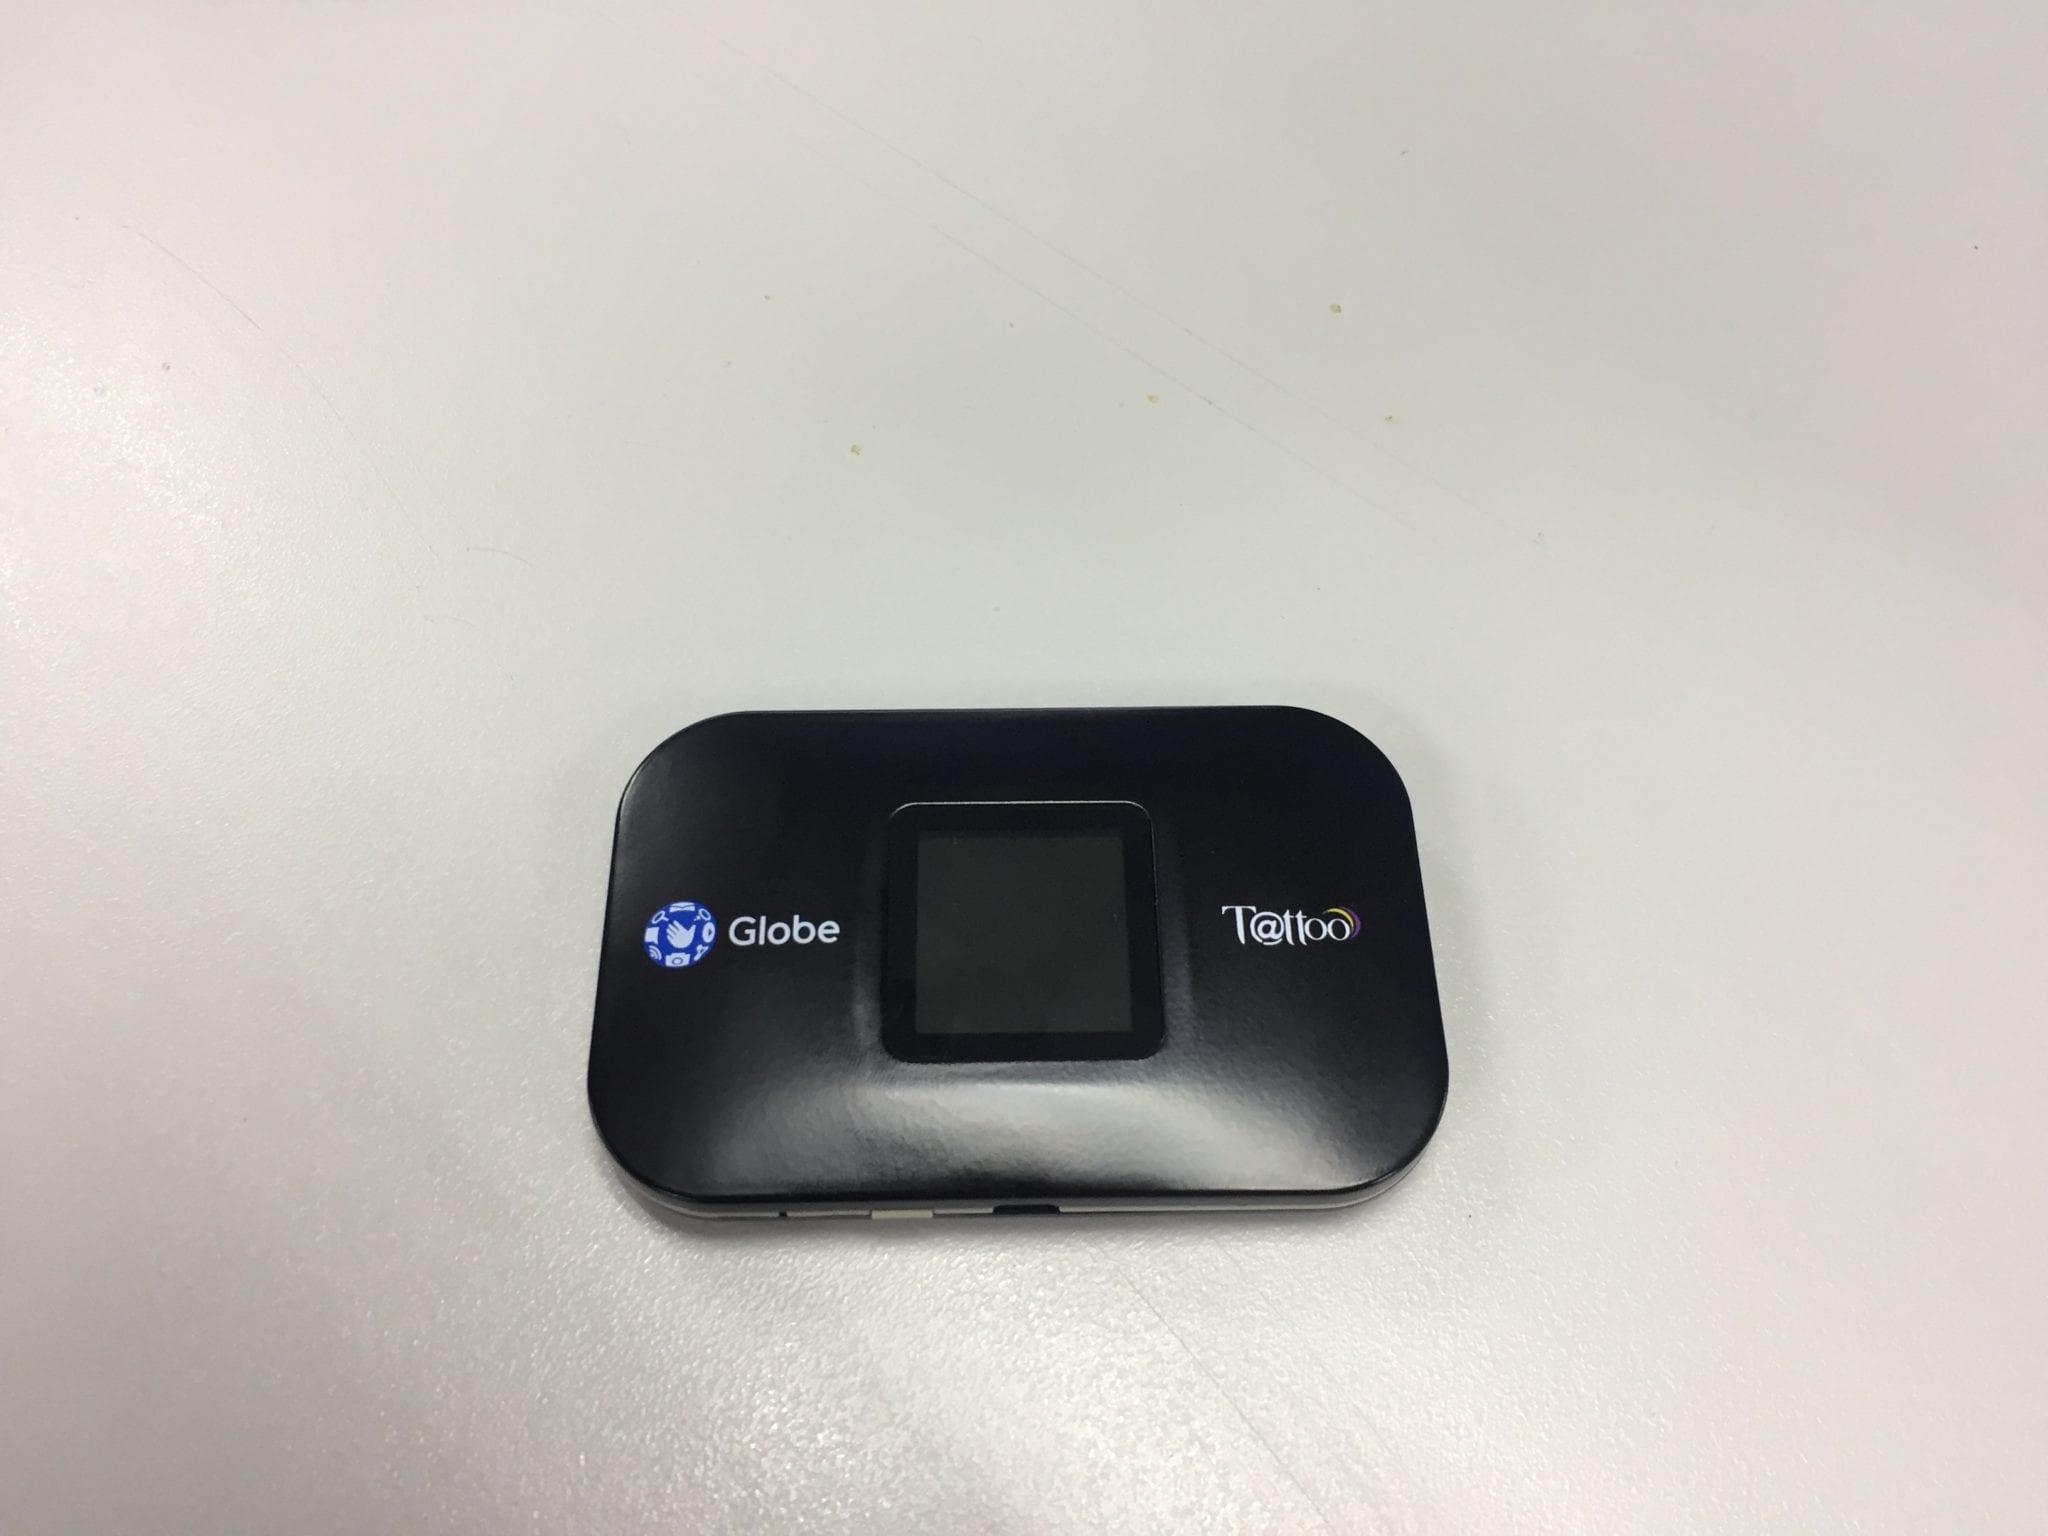 Globe Tattoo LTE Mobile WiFi Review header.